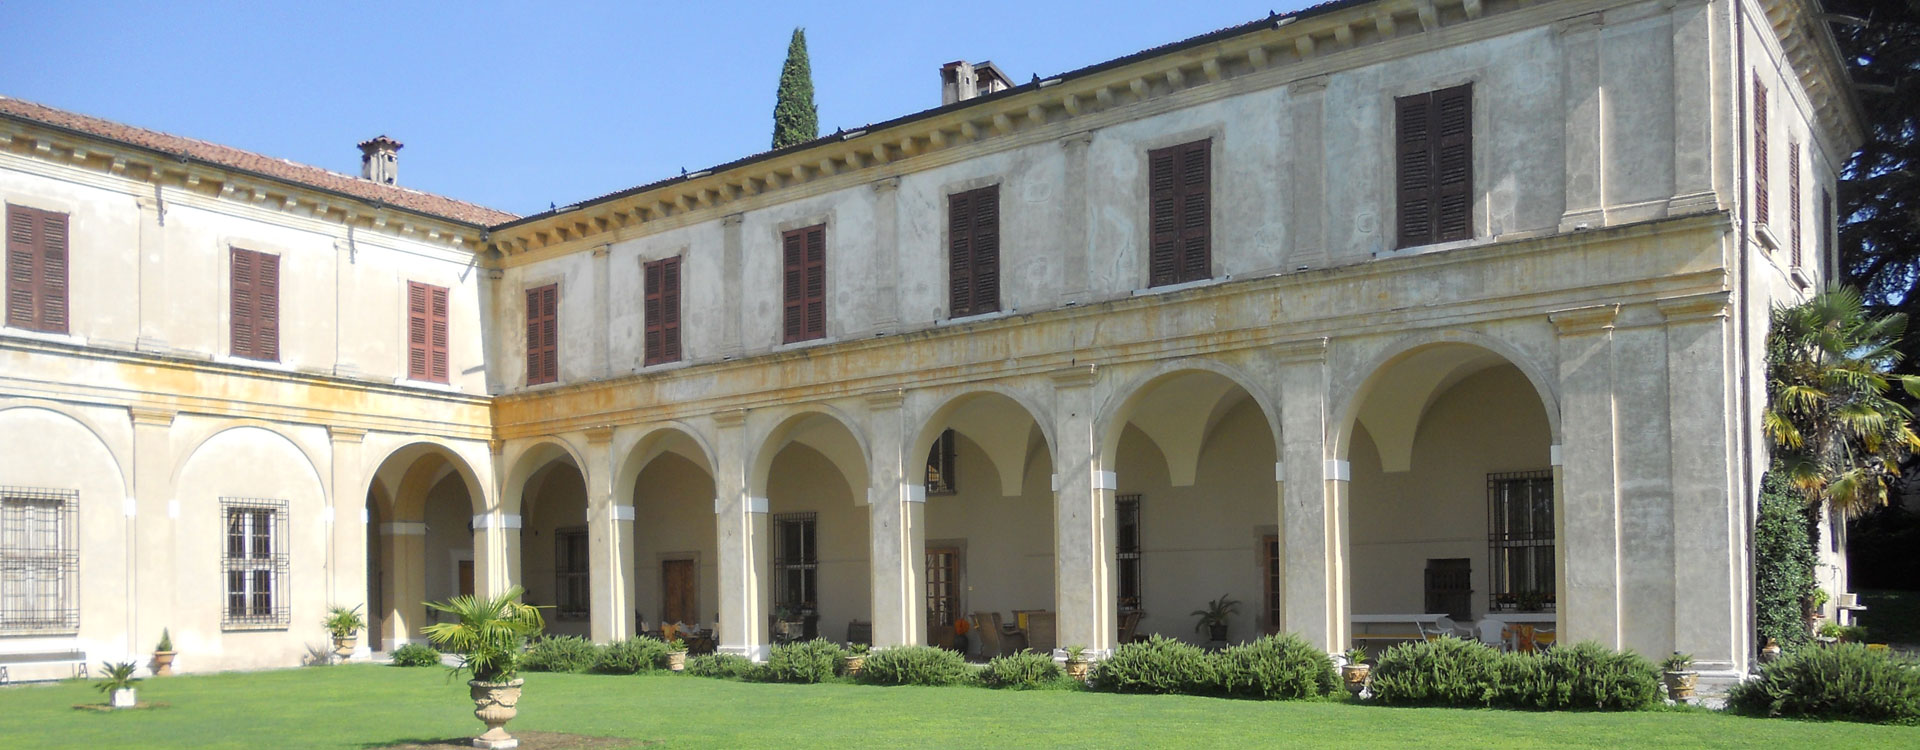 Palazzo Secco D&apos;Aragona<br> Expo 2015